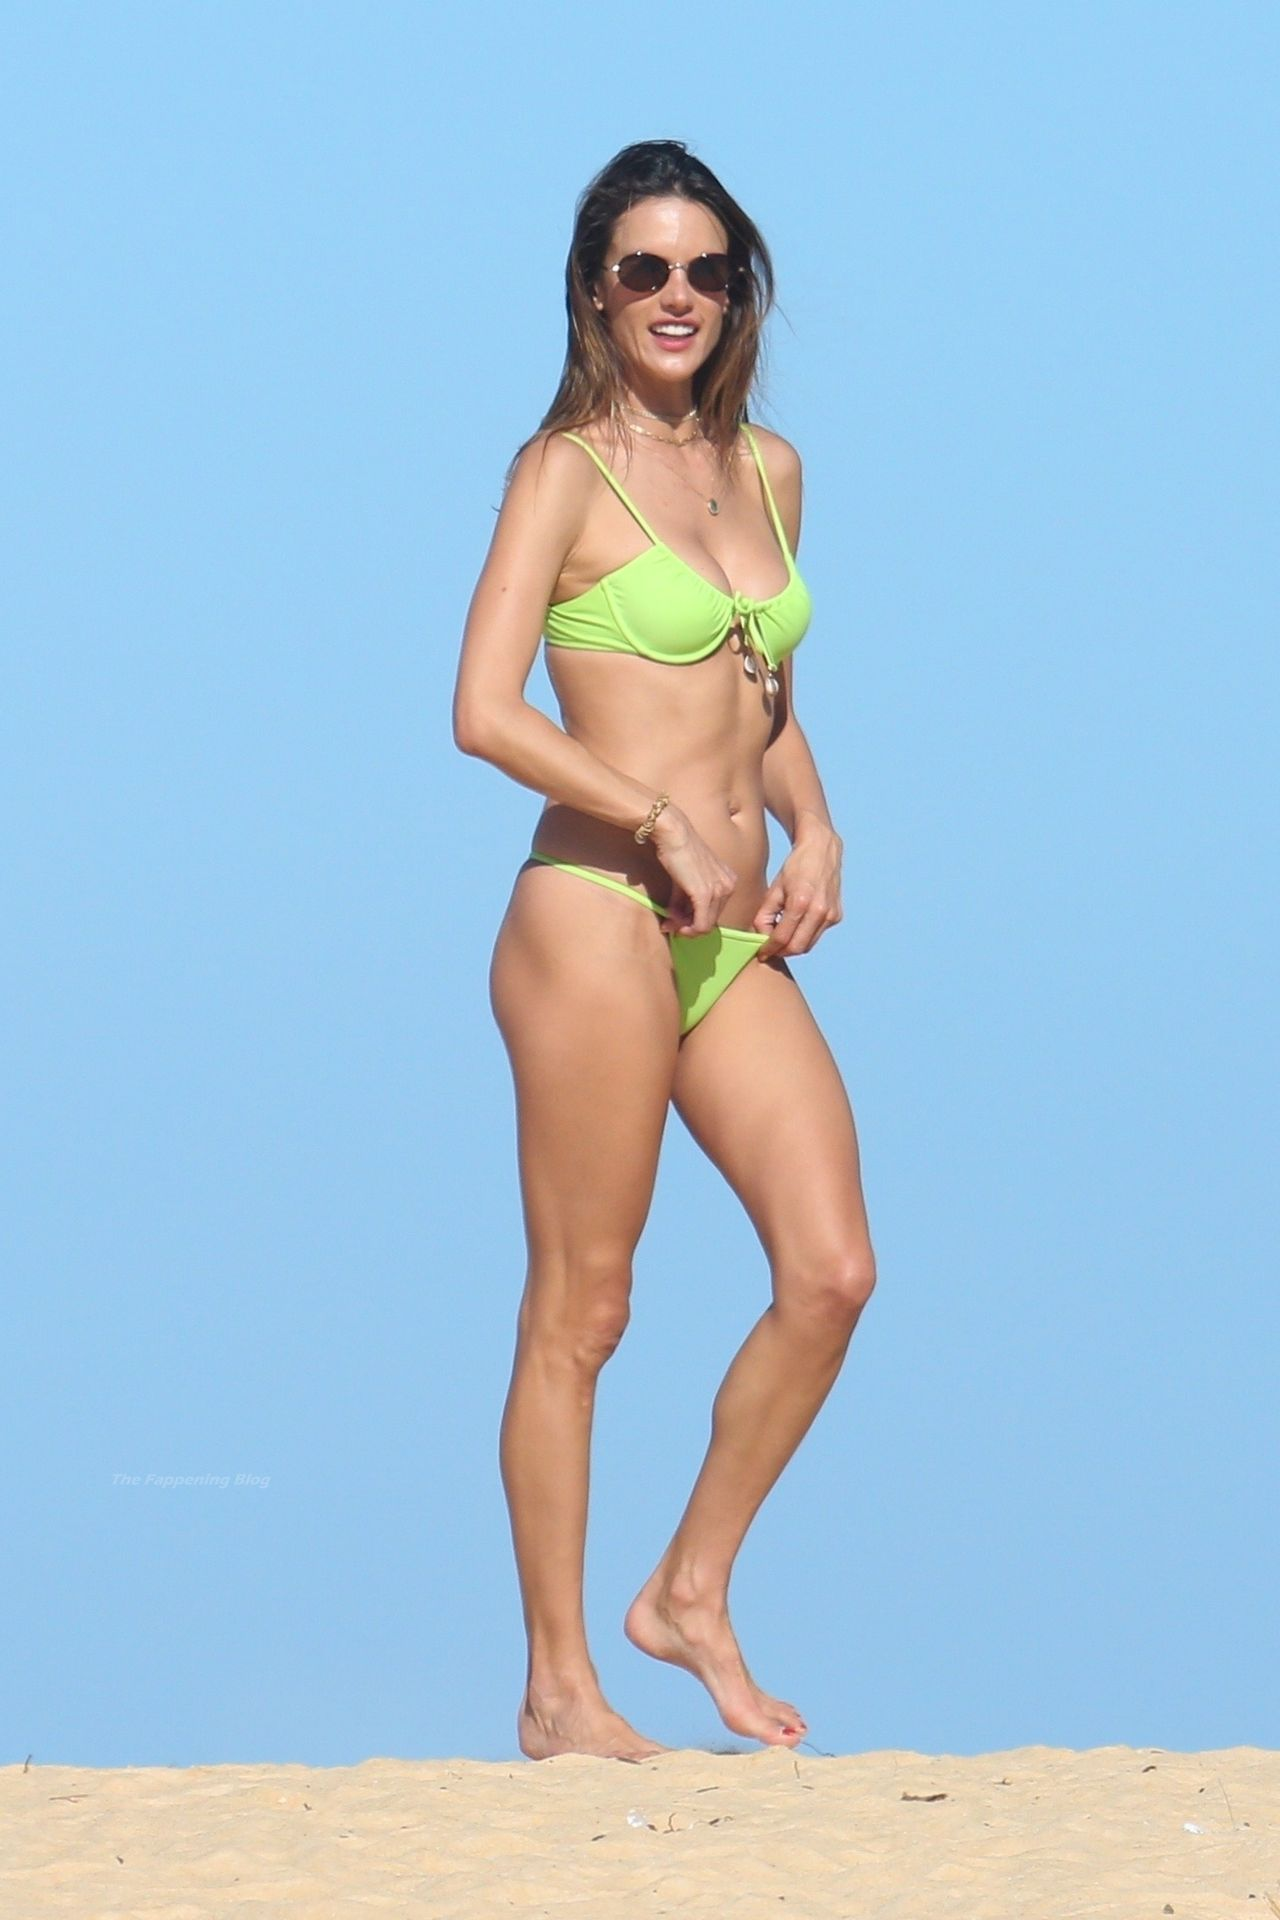 Alessandra-Ambrosio-Sexy-The-Fappening-Blog-761.jpg